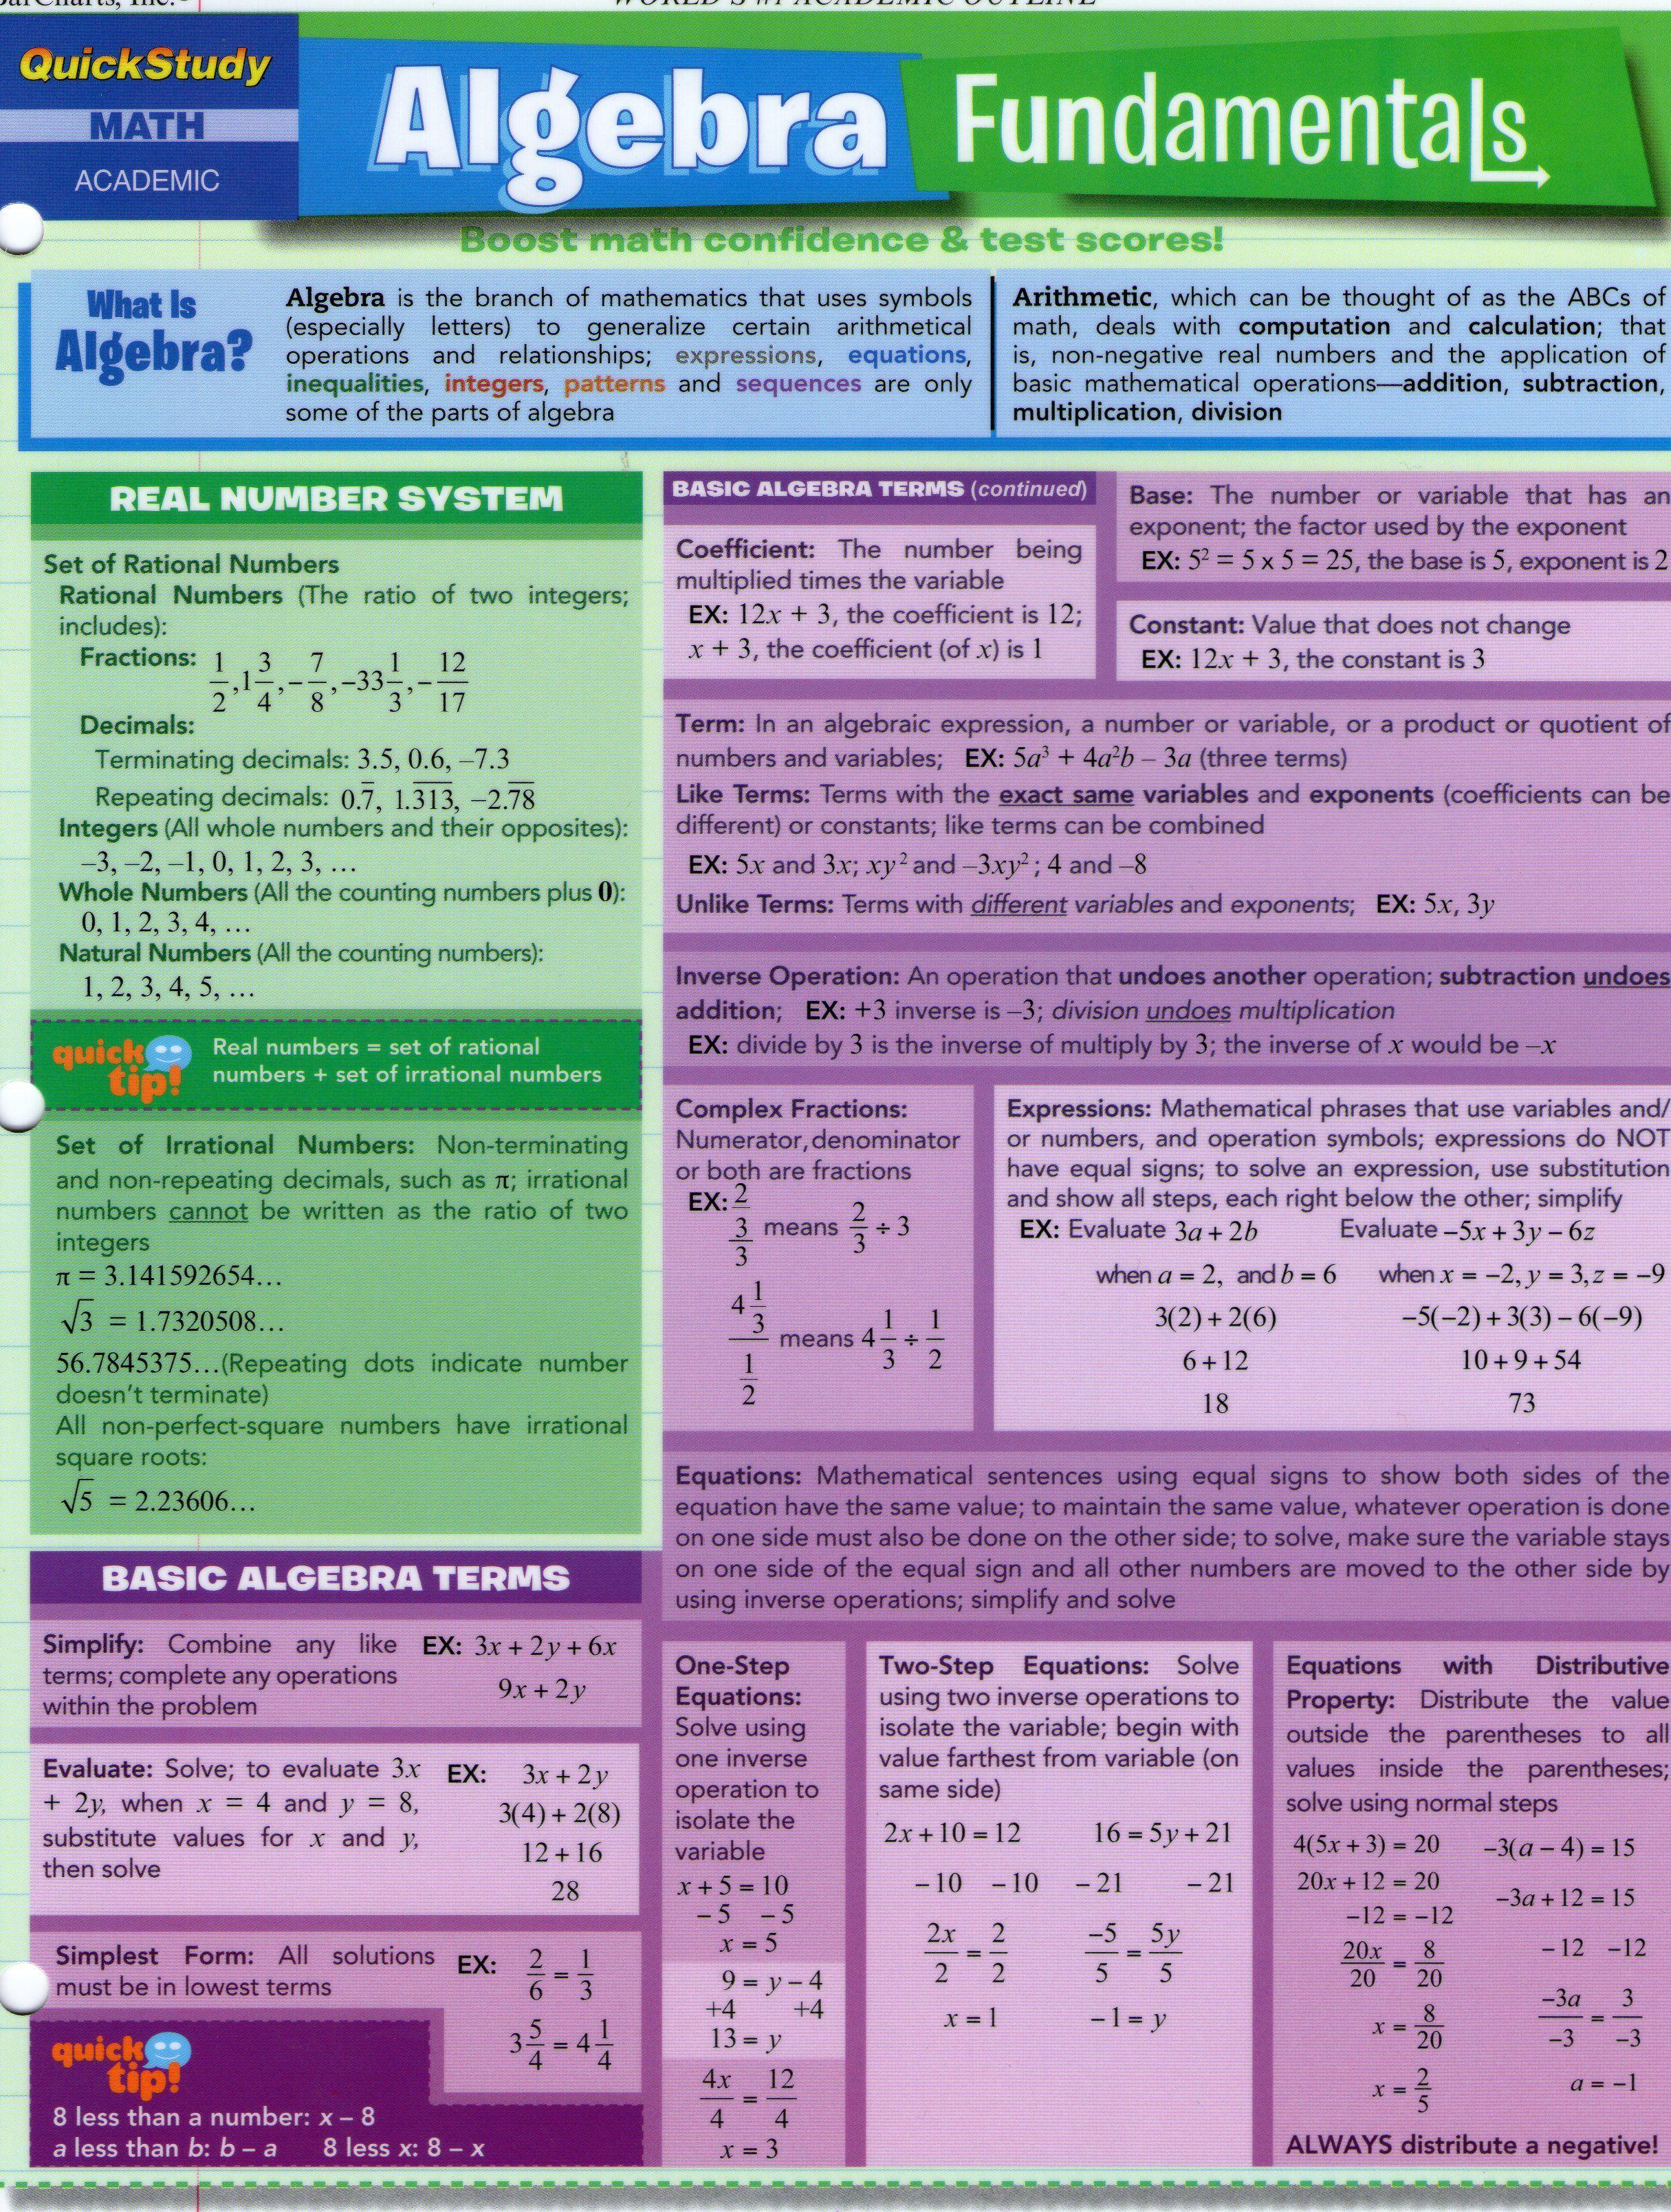 Algebra Fundamentals 1